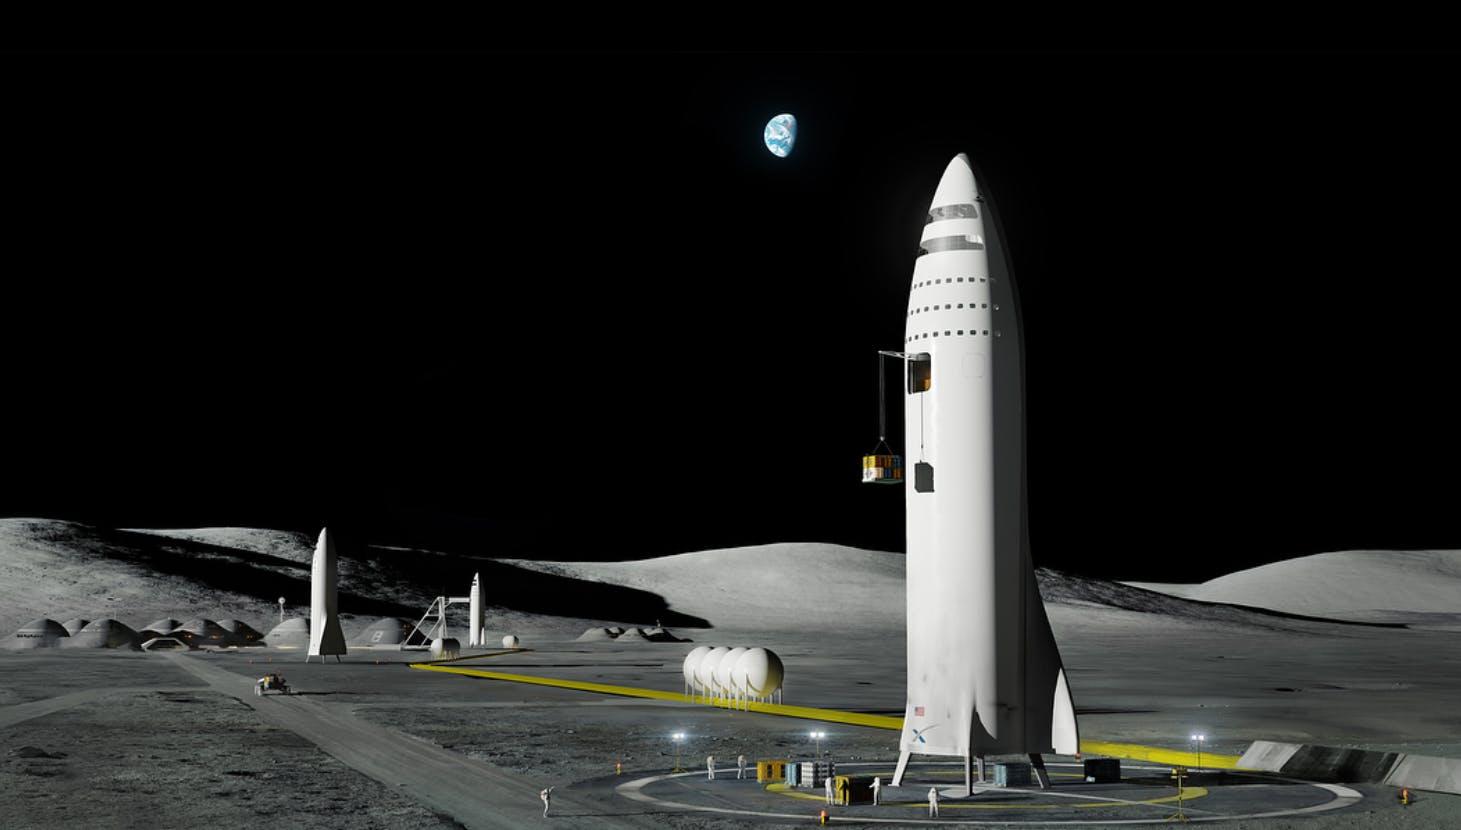 spacex bfr lunar colony